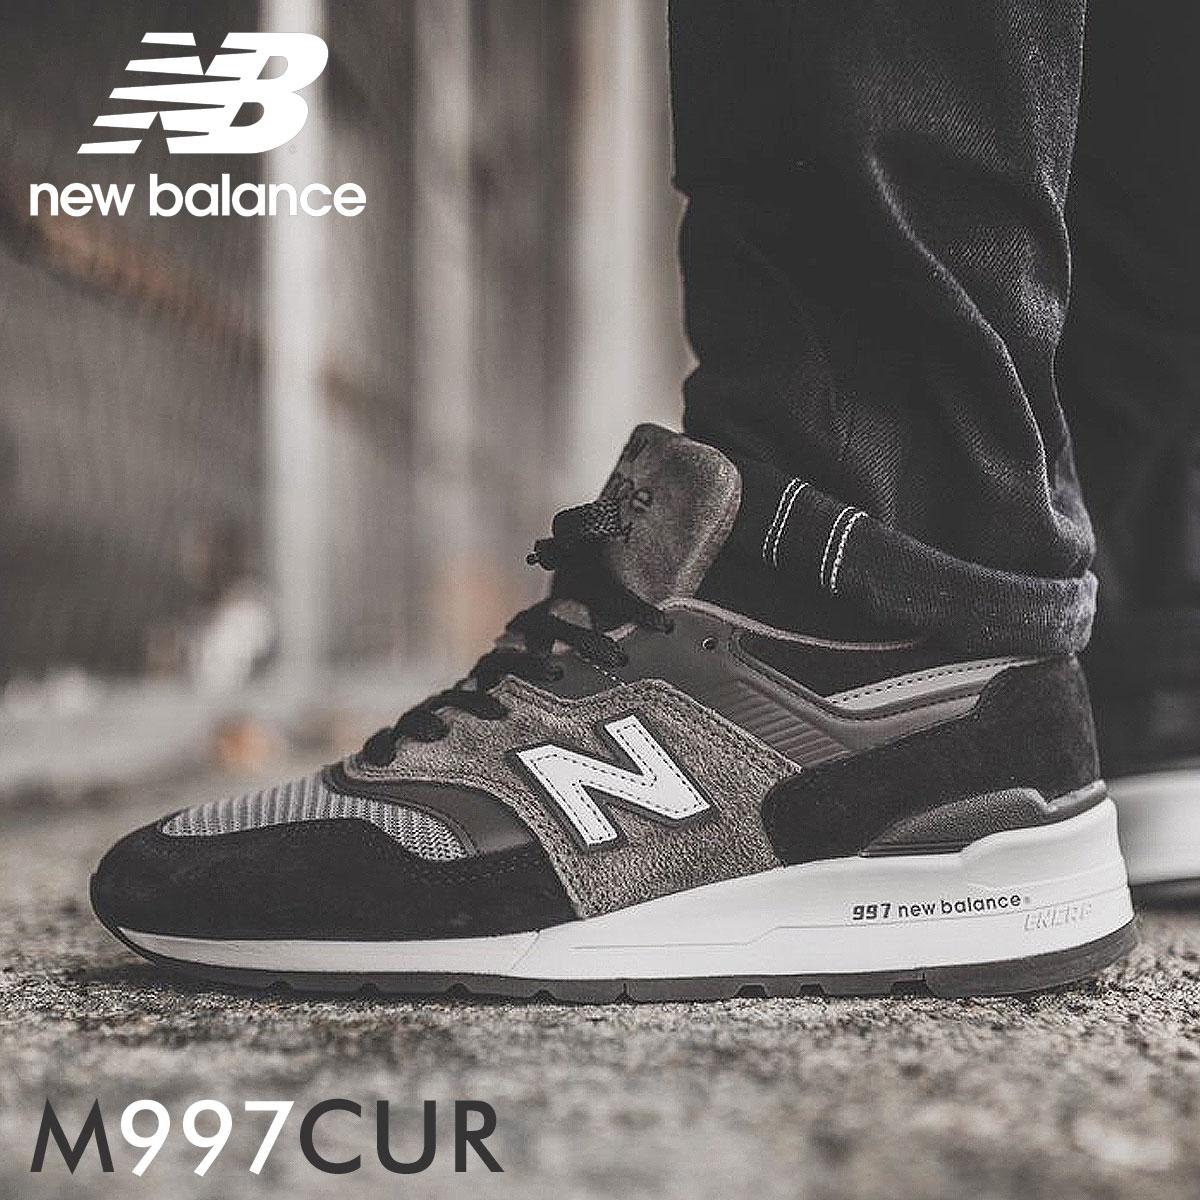 detailed images wholesale online buy popular new balance 997 men's New Balance sneakers M997CUR D Wise shoes black black